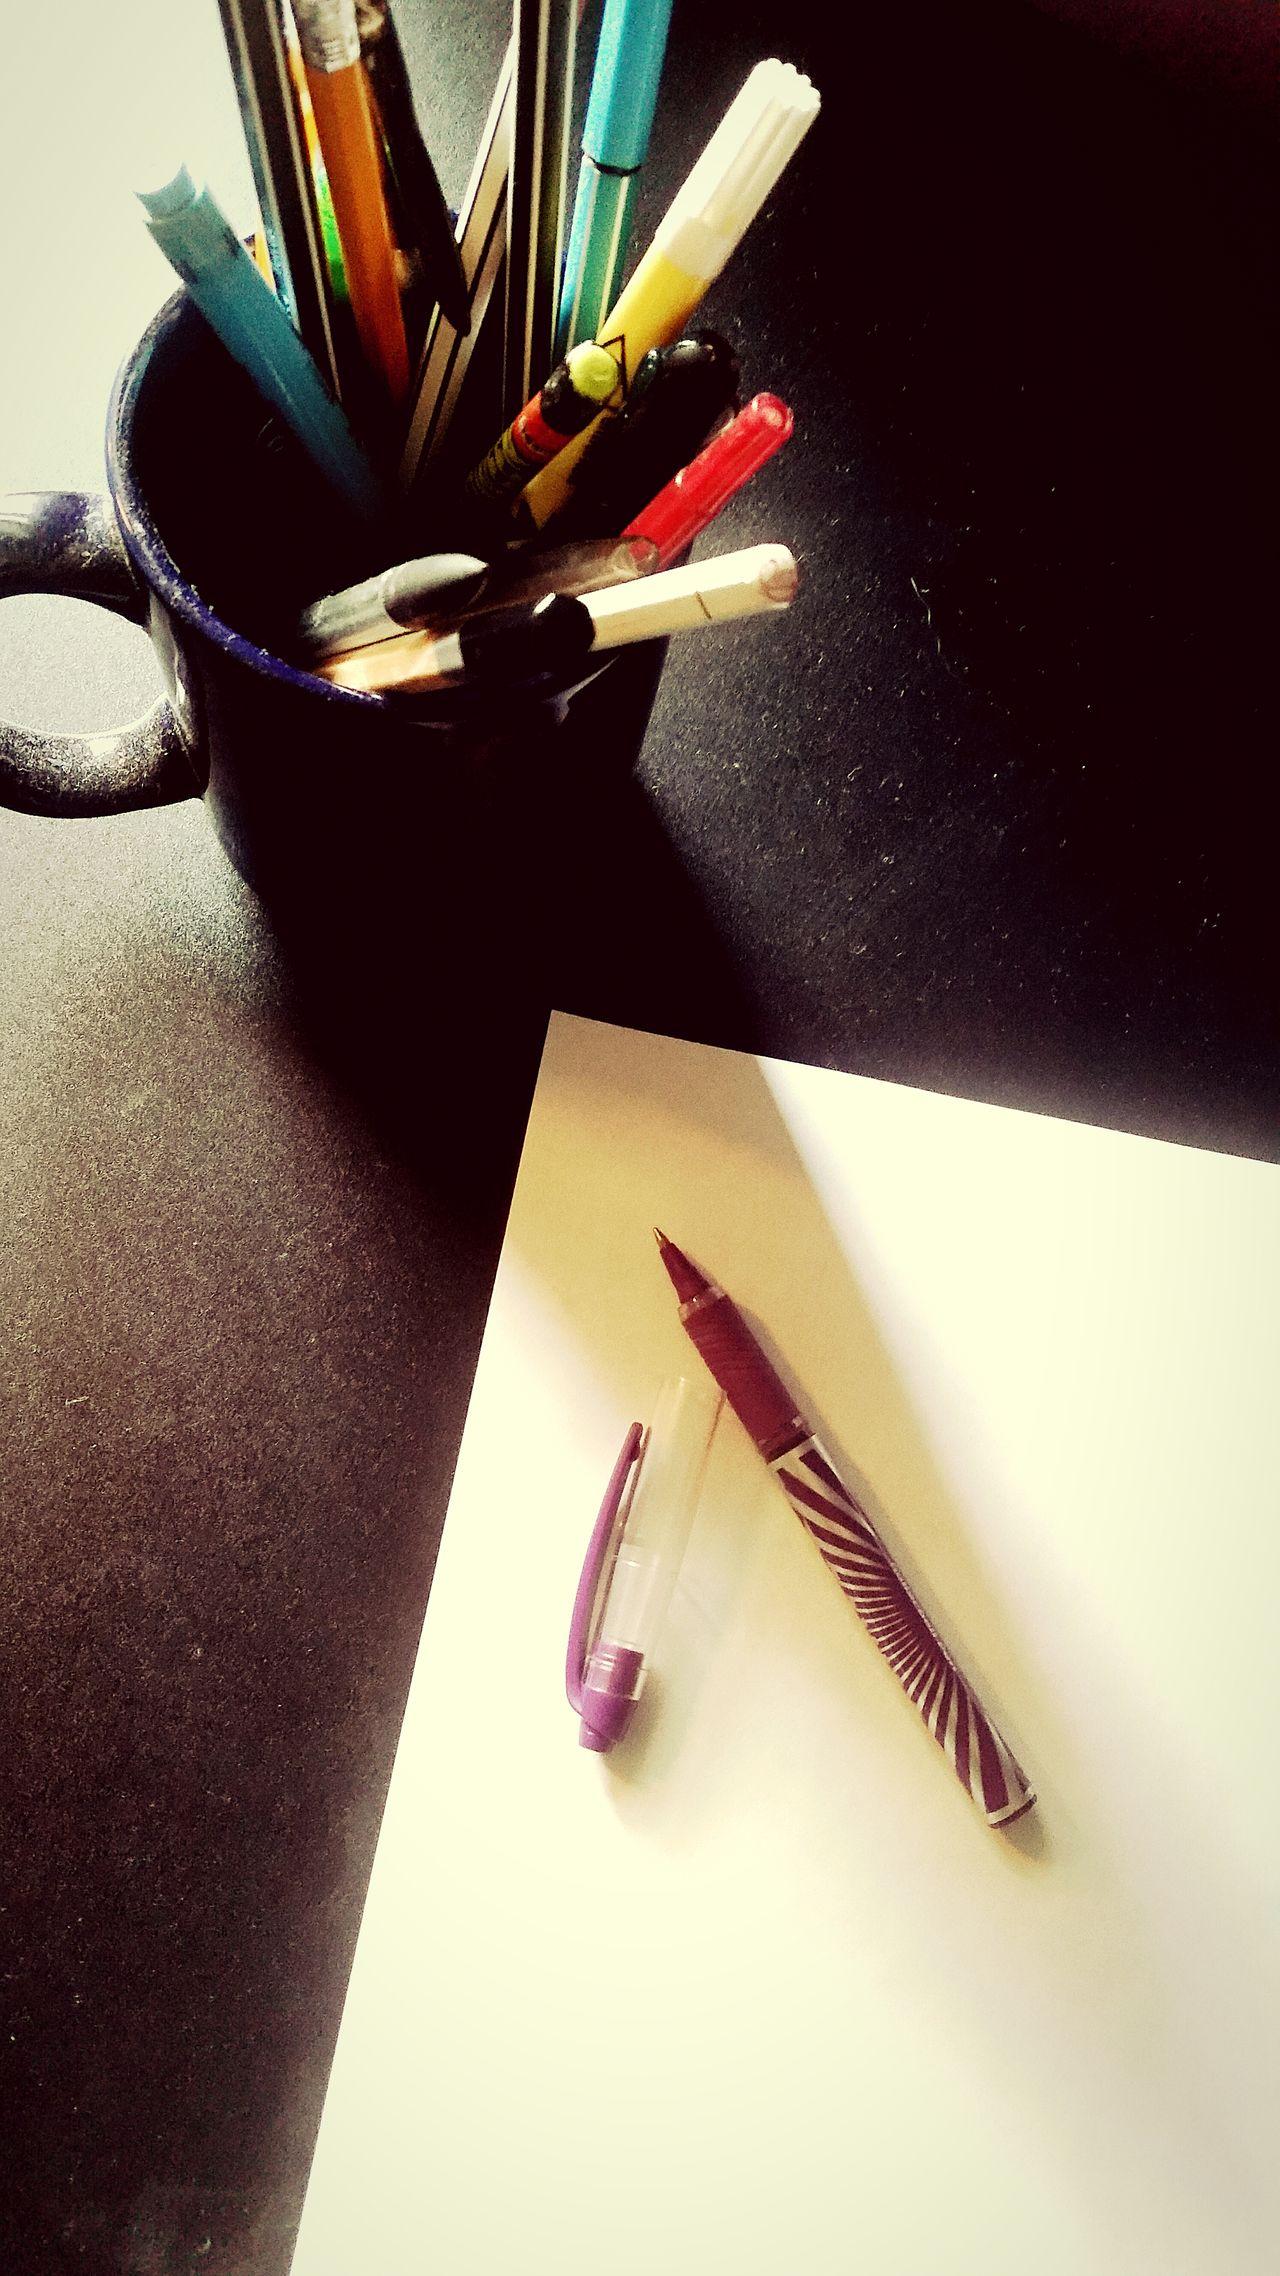 Life Art Power Of The Pen